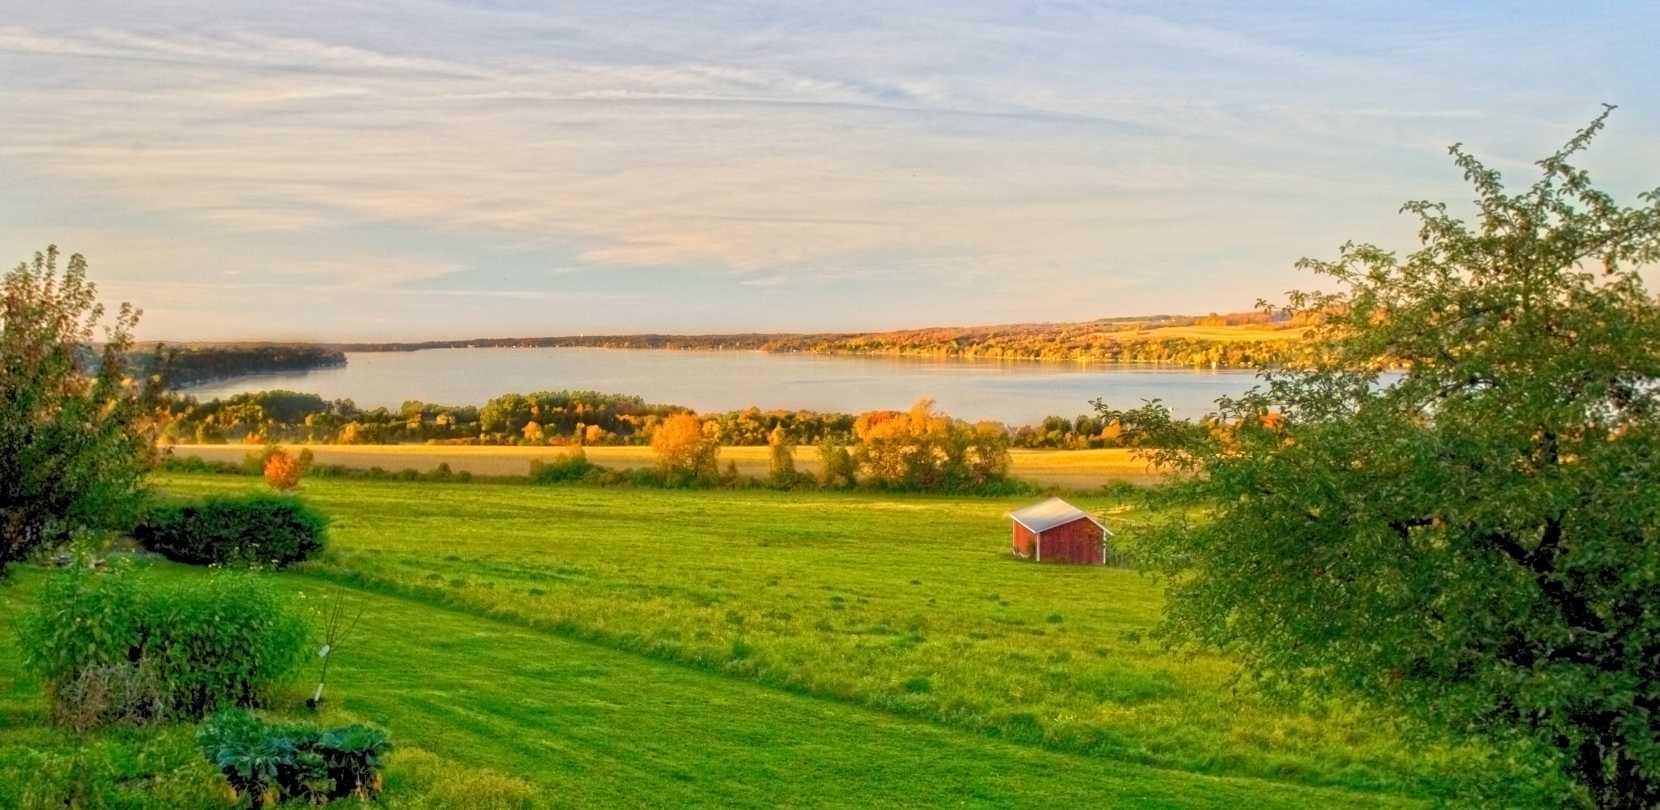 New york cayuga county - Owasco Lake